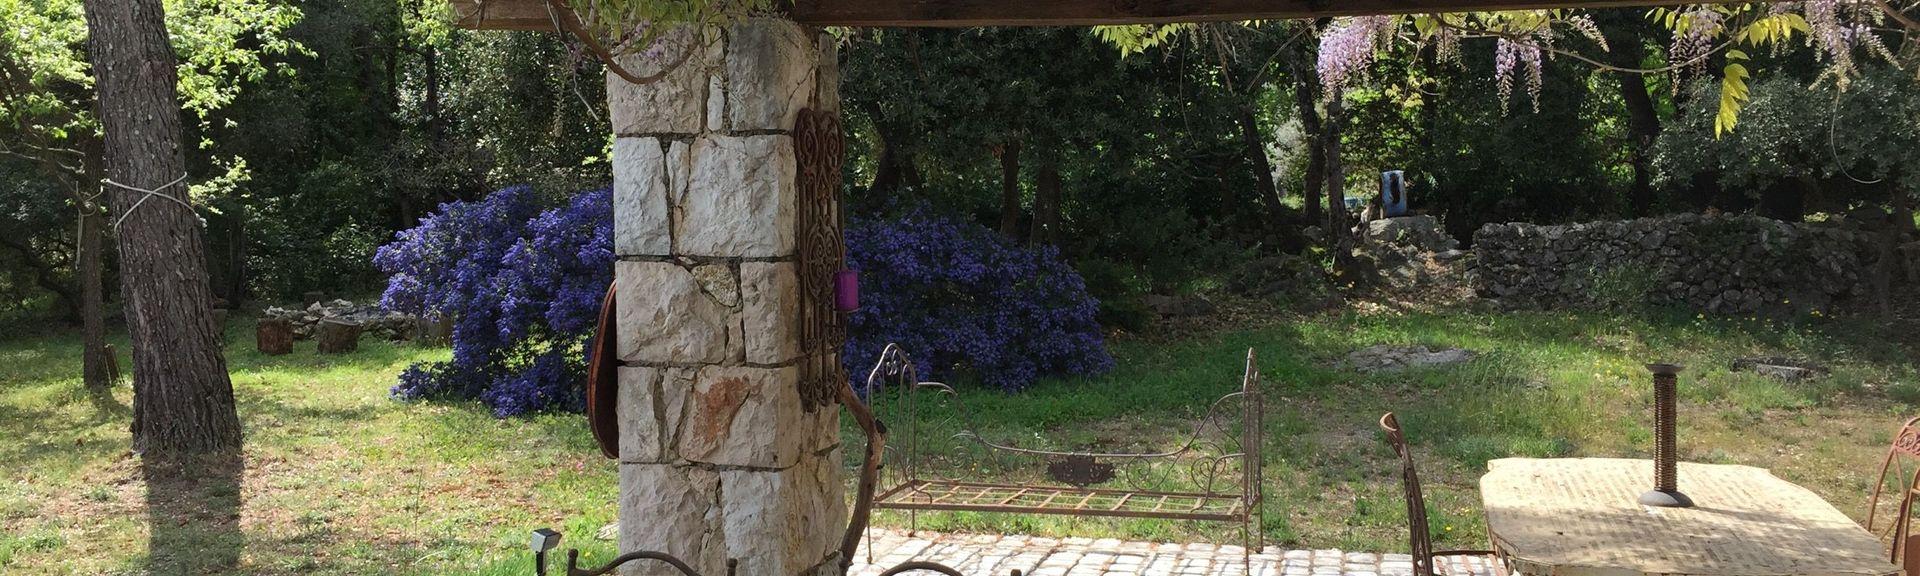 Fayence, Provenza-Alpes-Costa Azul, Francia